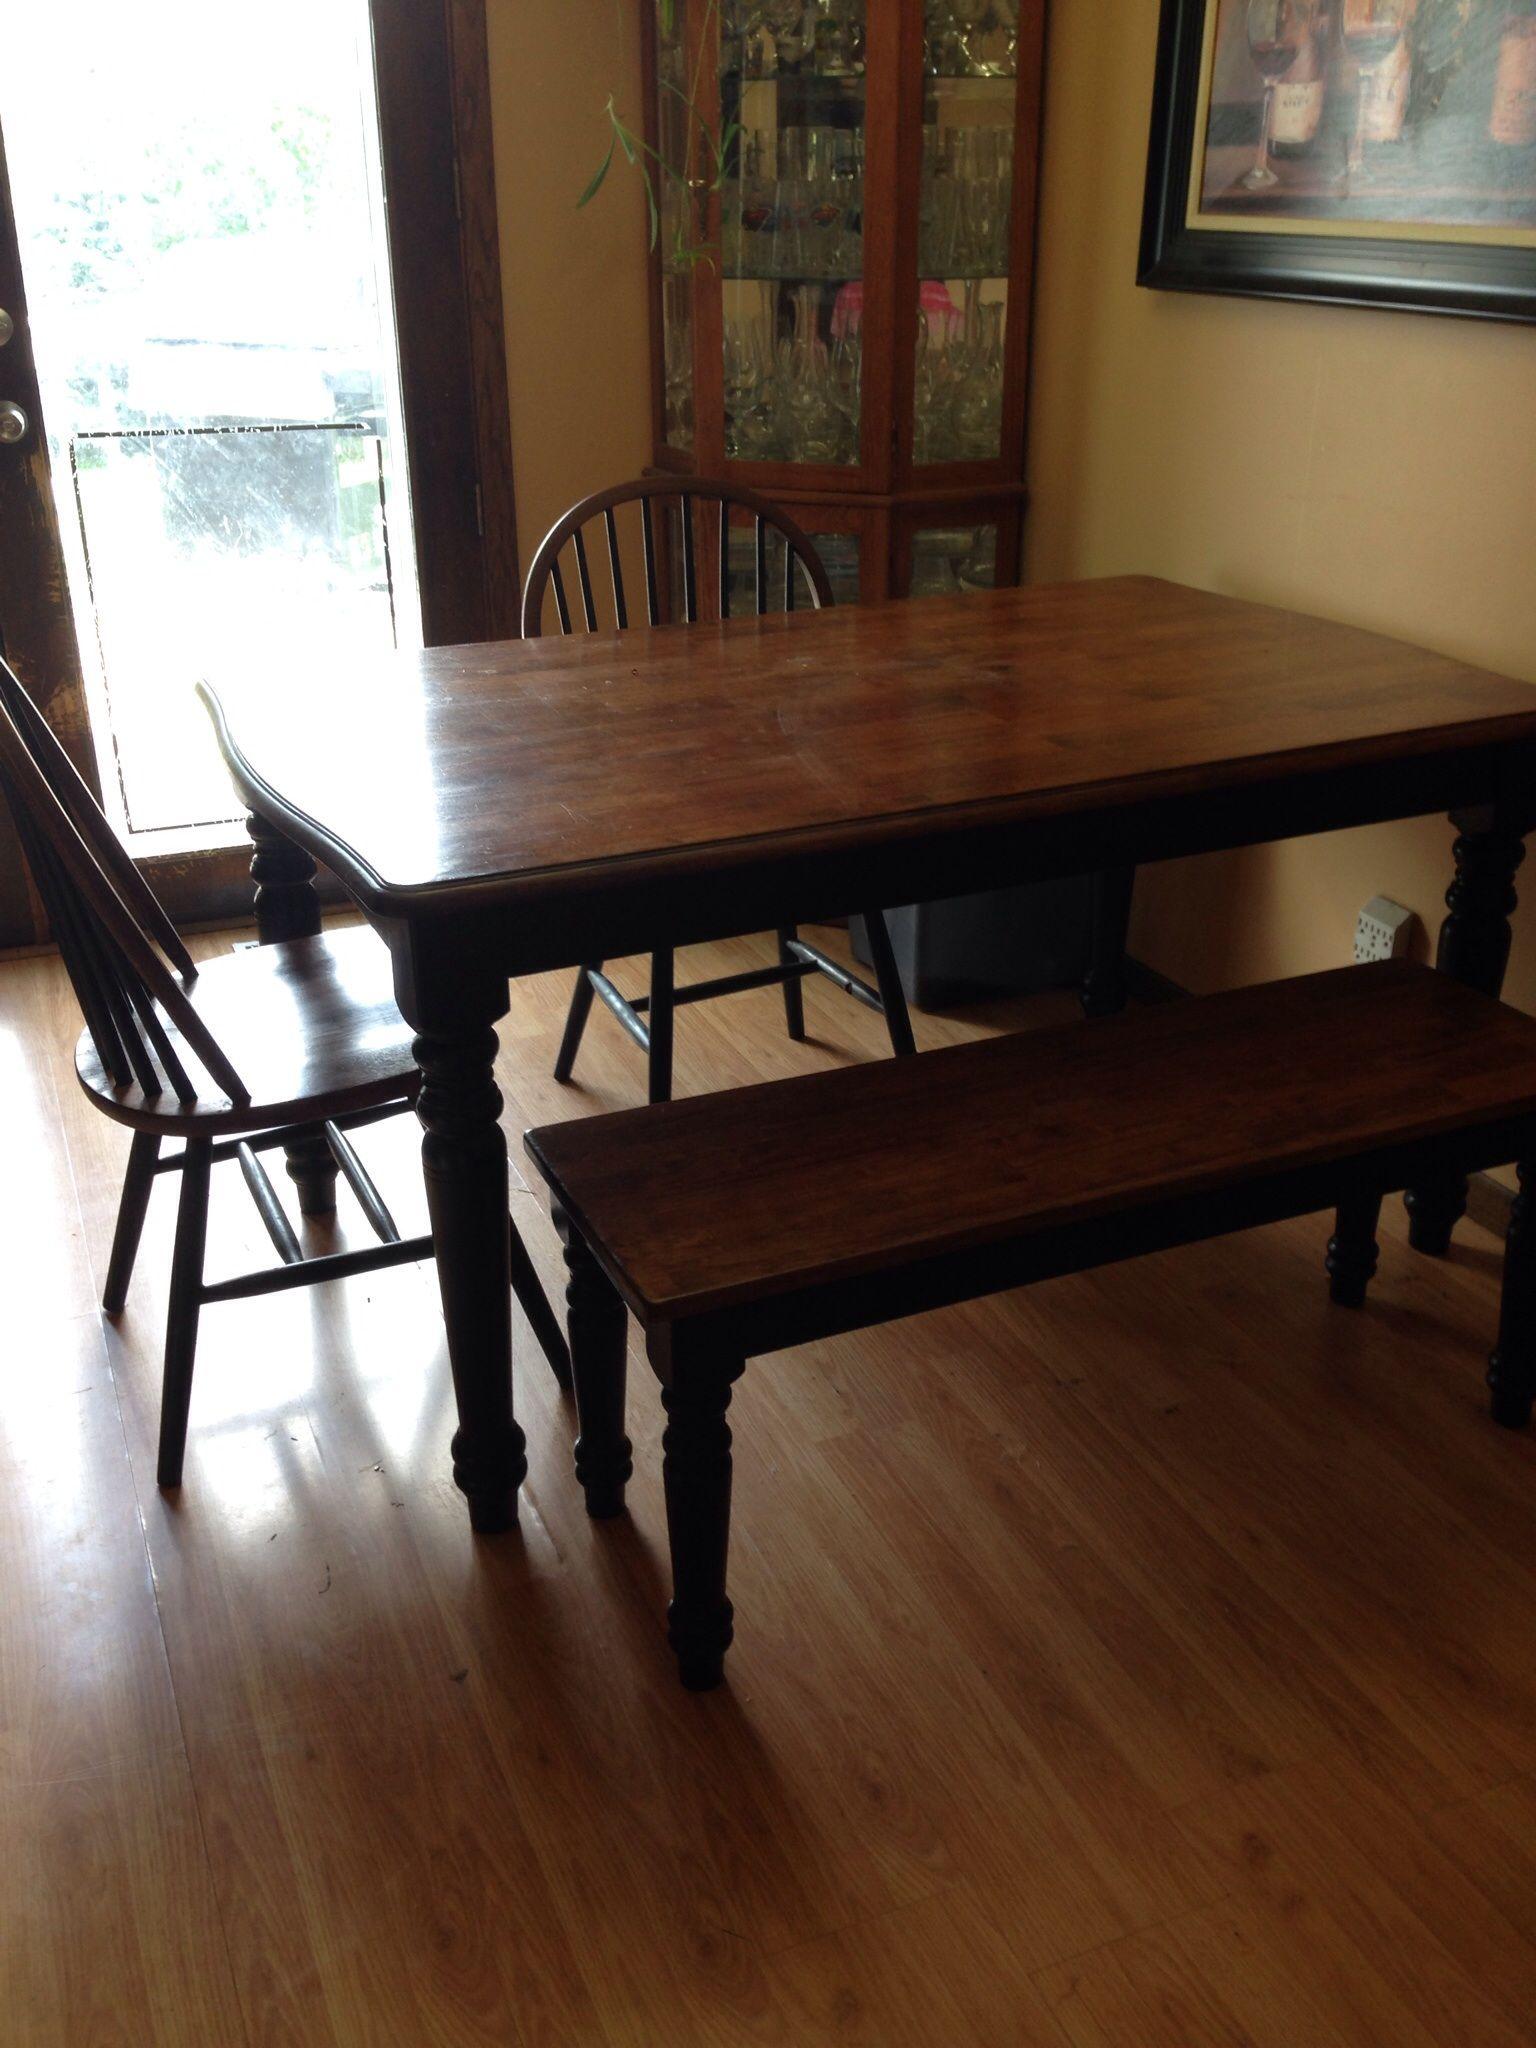 Kitchen Table With Bench In Natalierose S Garage Sale Rosemount